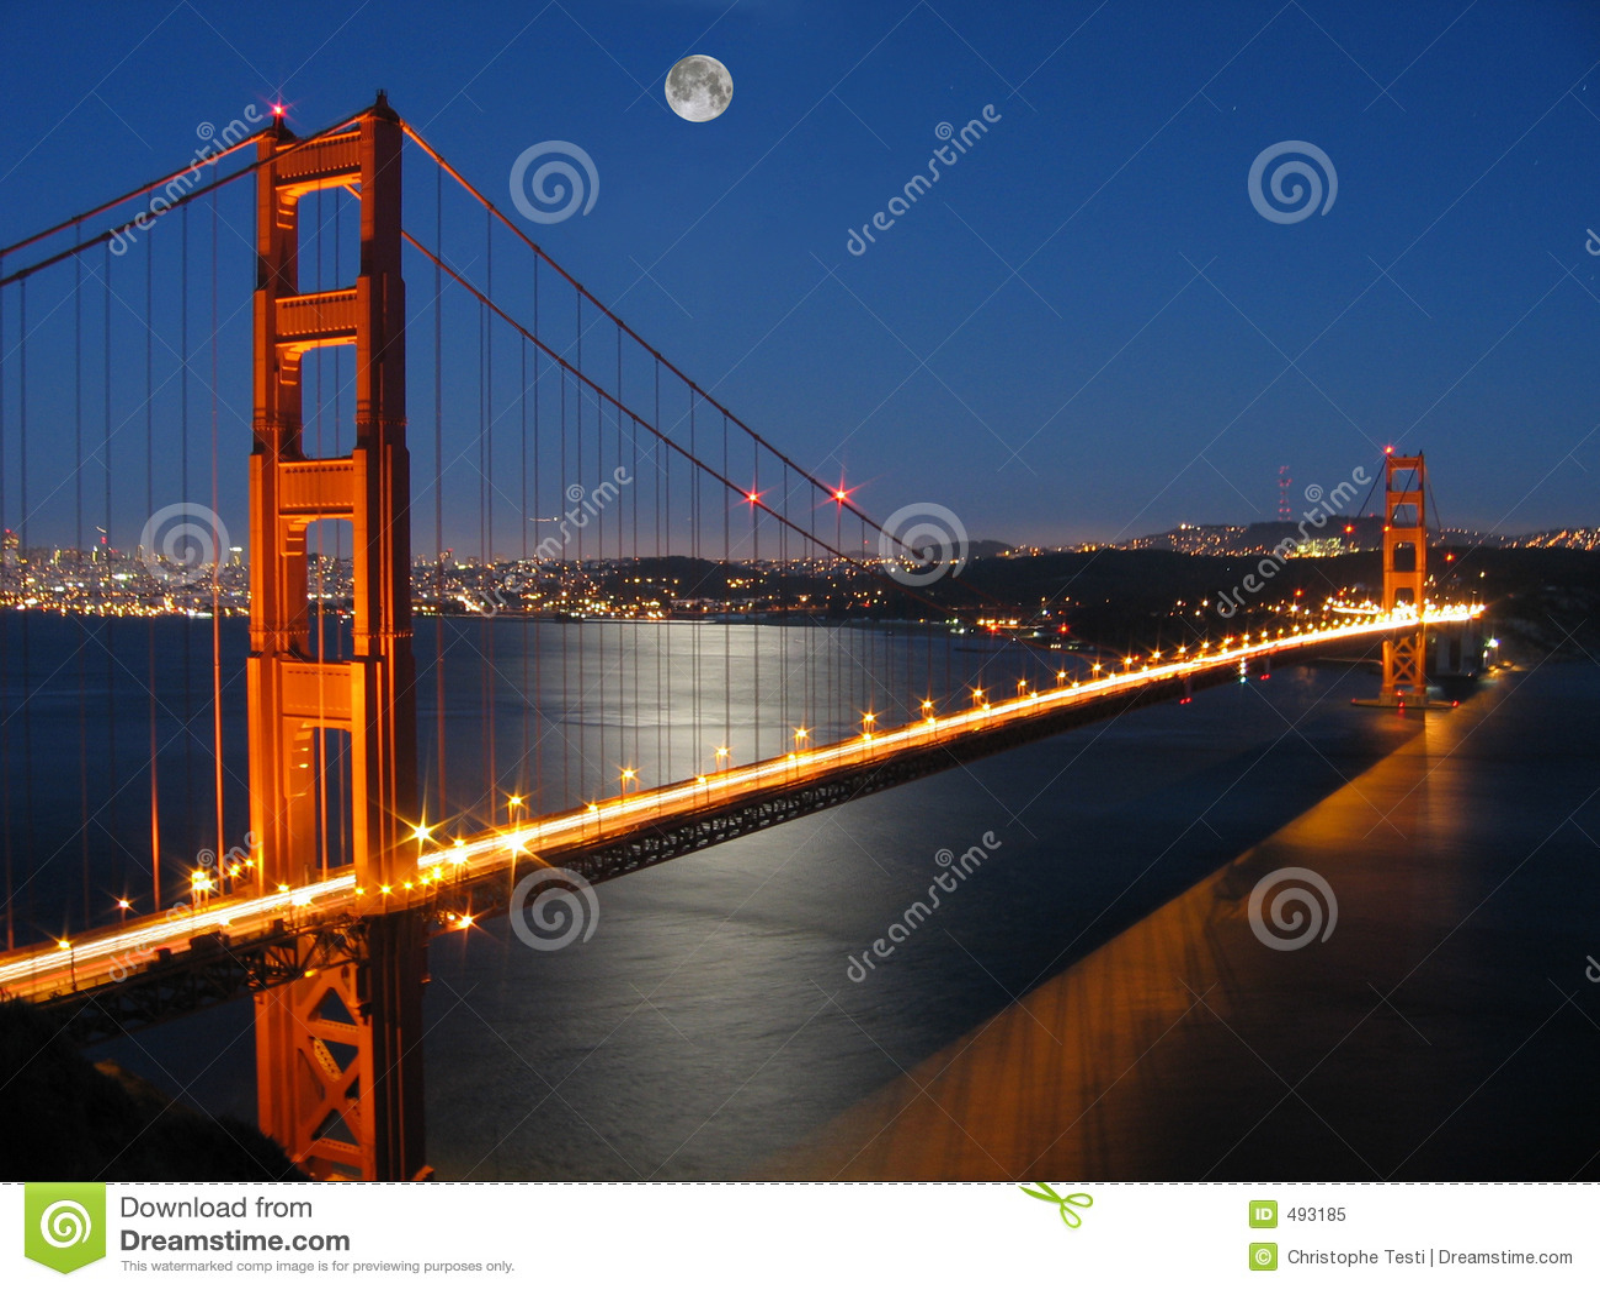 Golden Gate Bridge with Moon light